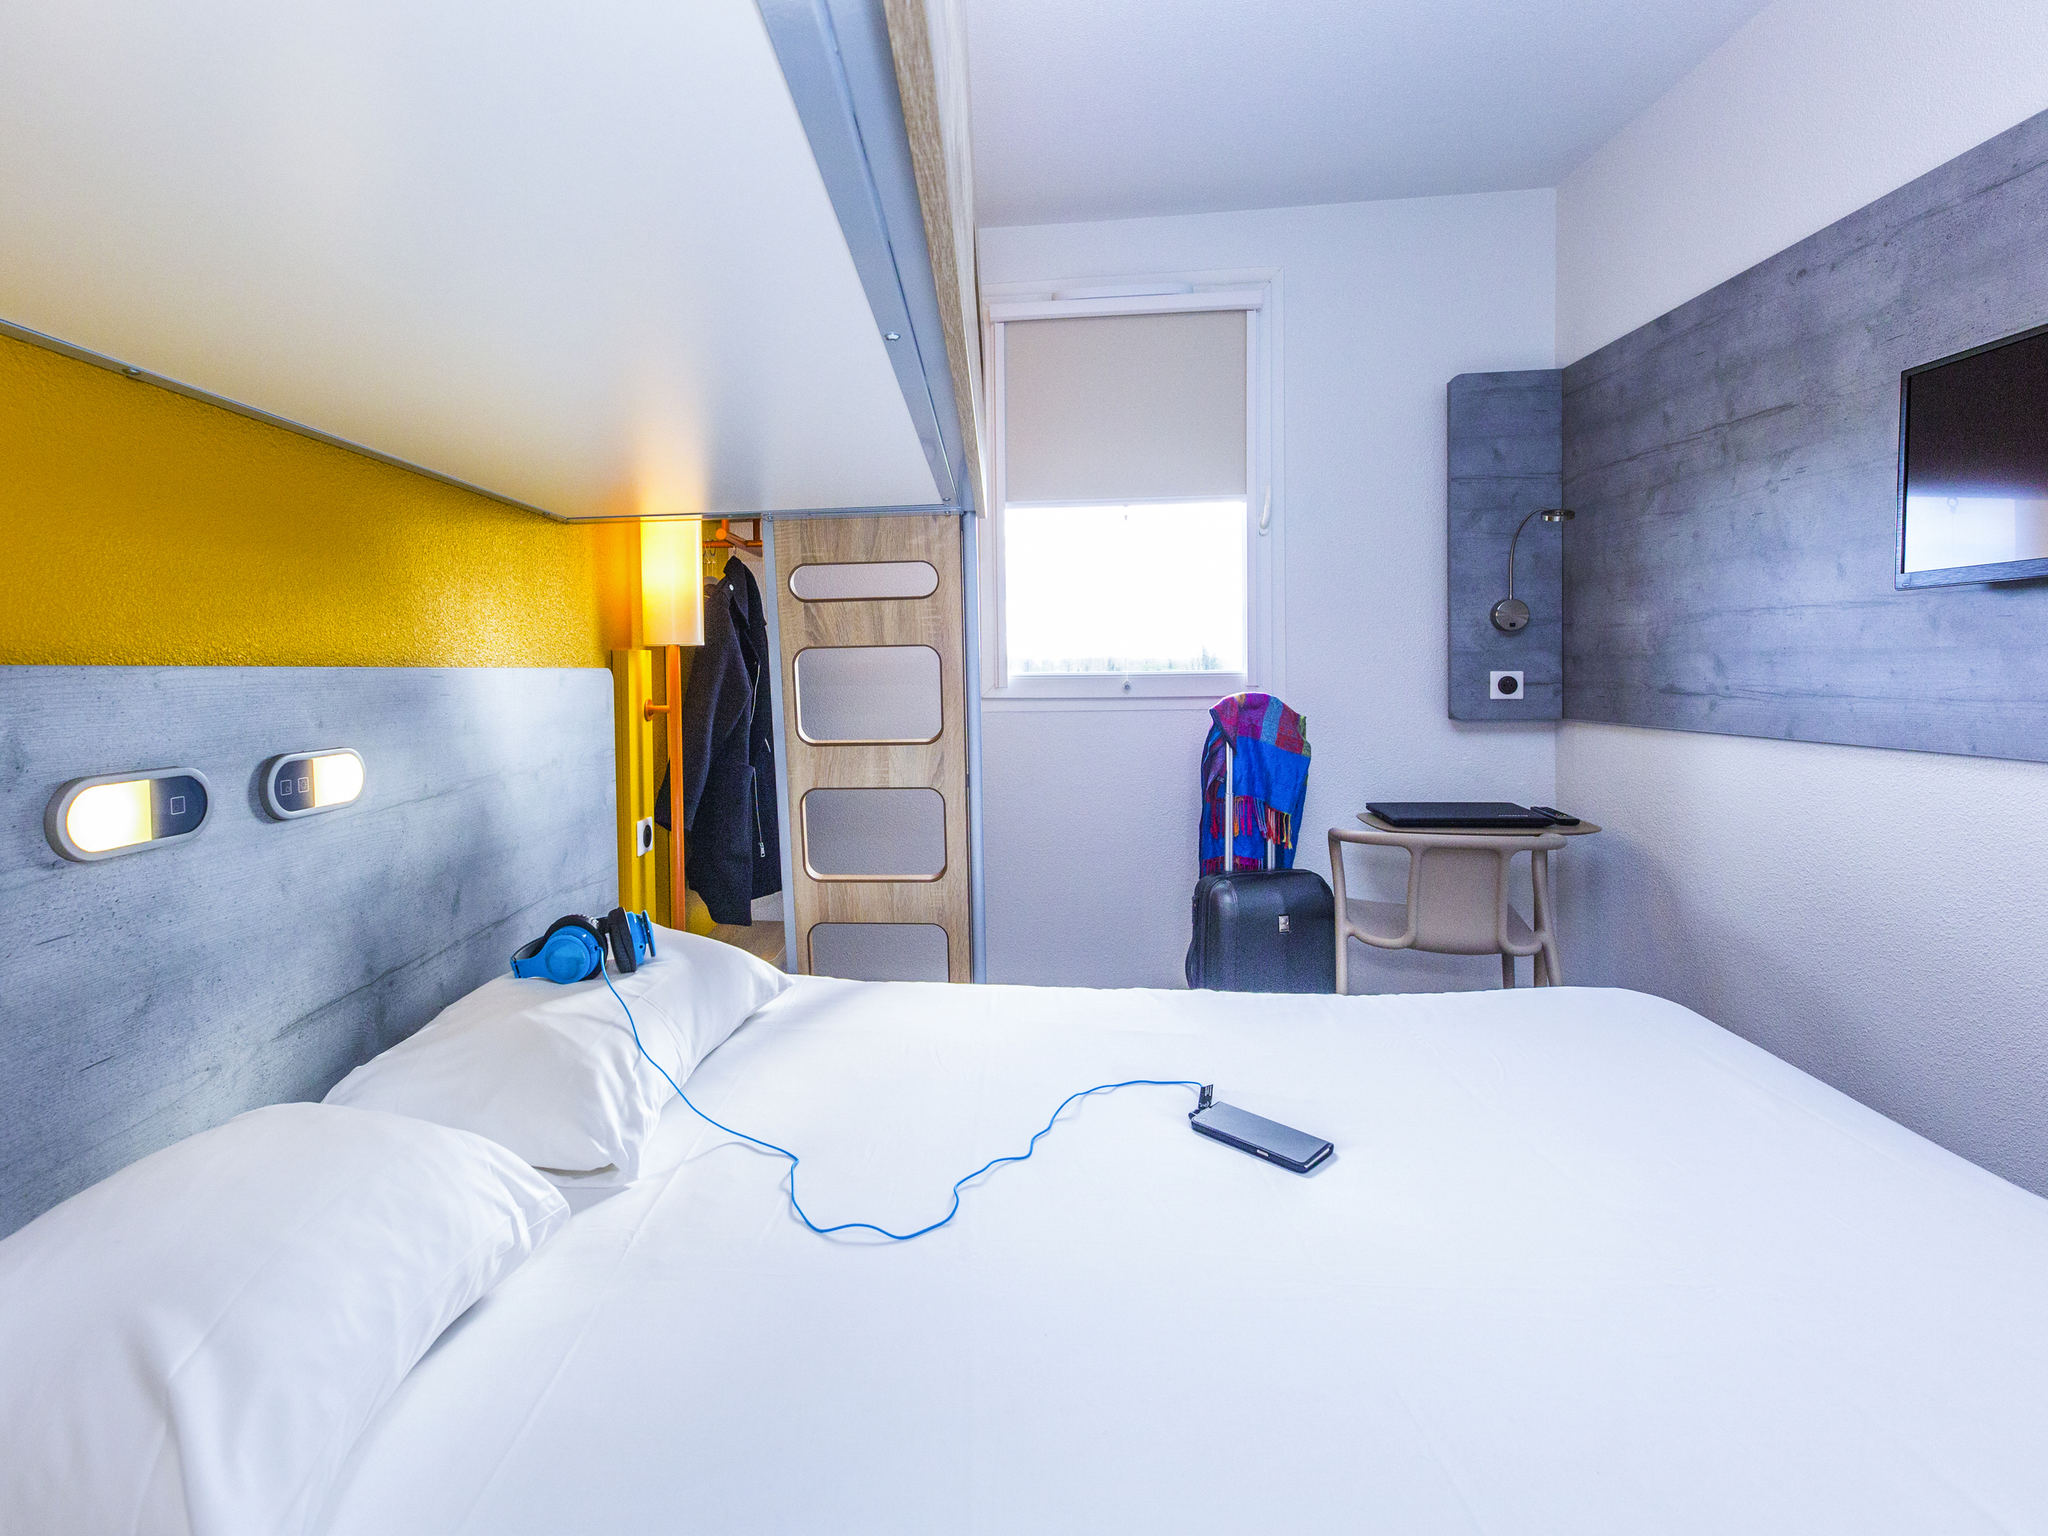 hotel in marmande ibis budget marmande. Black Bedroom Furniture Sets. Home Design Ideas